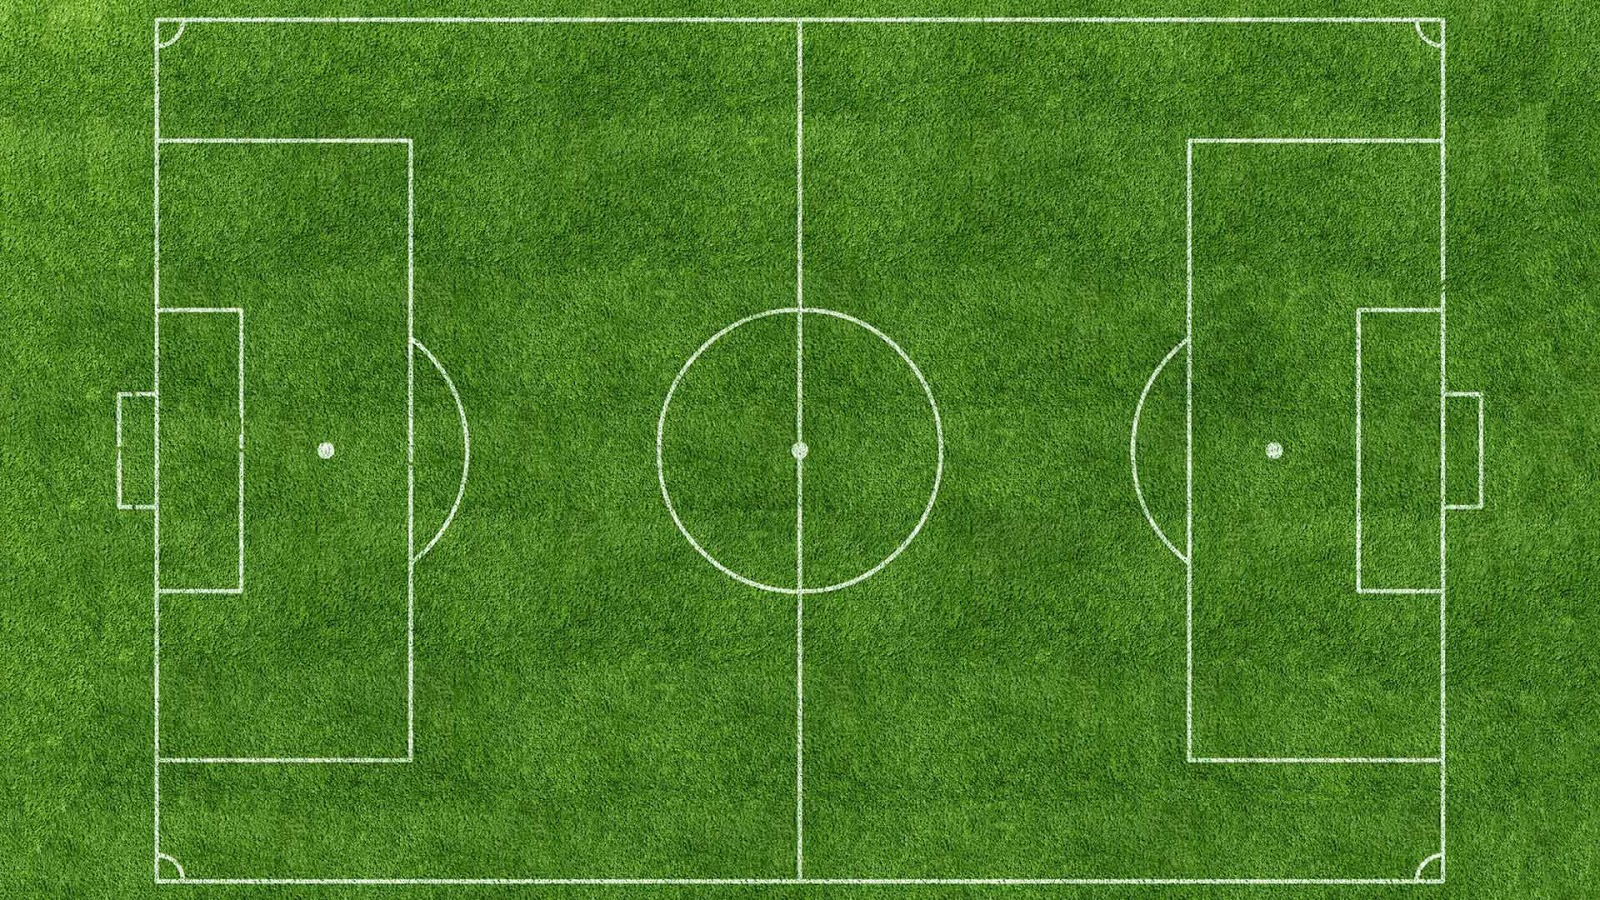 Livescore livescore today football score for Fondos de pantalla de futbol